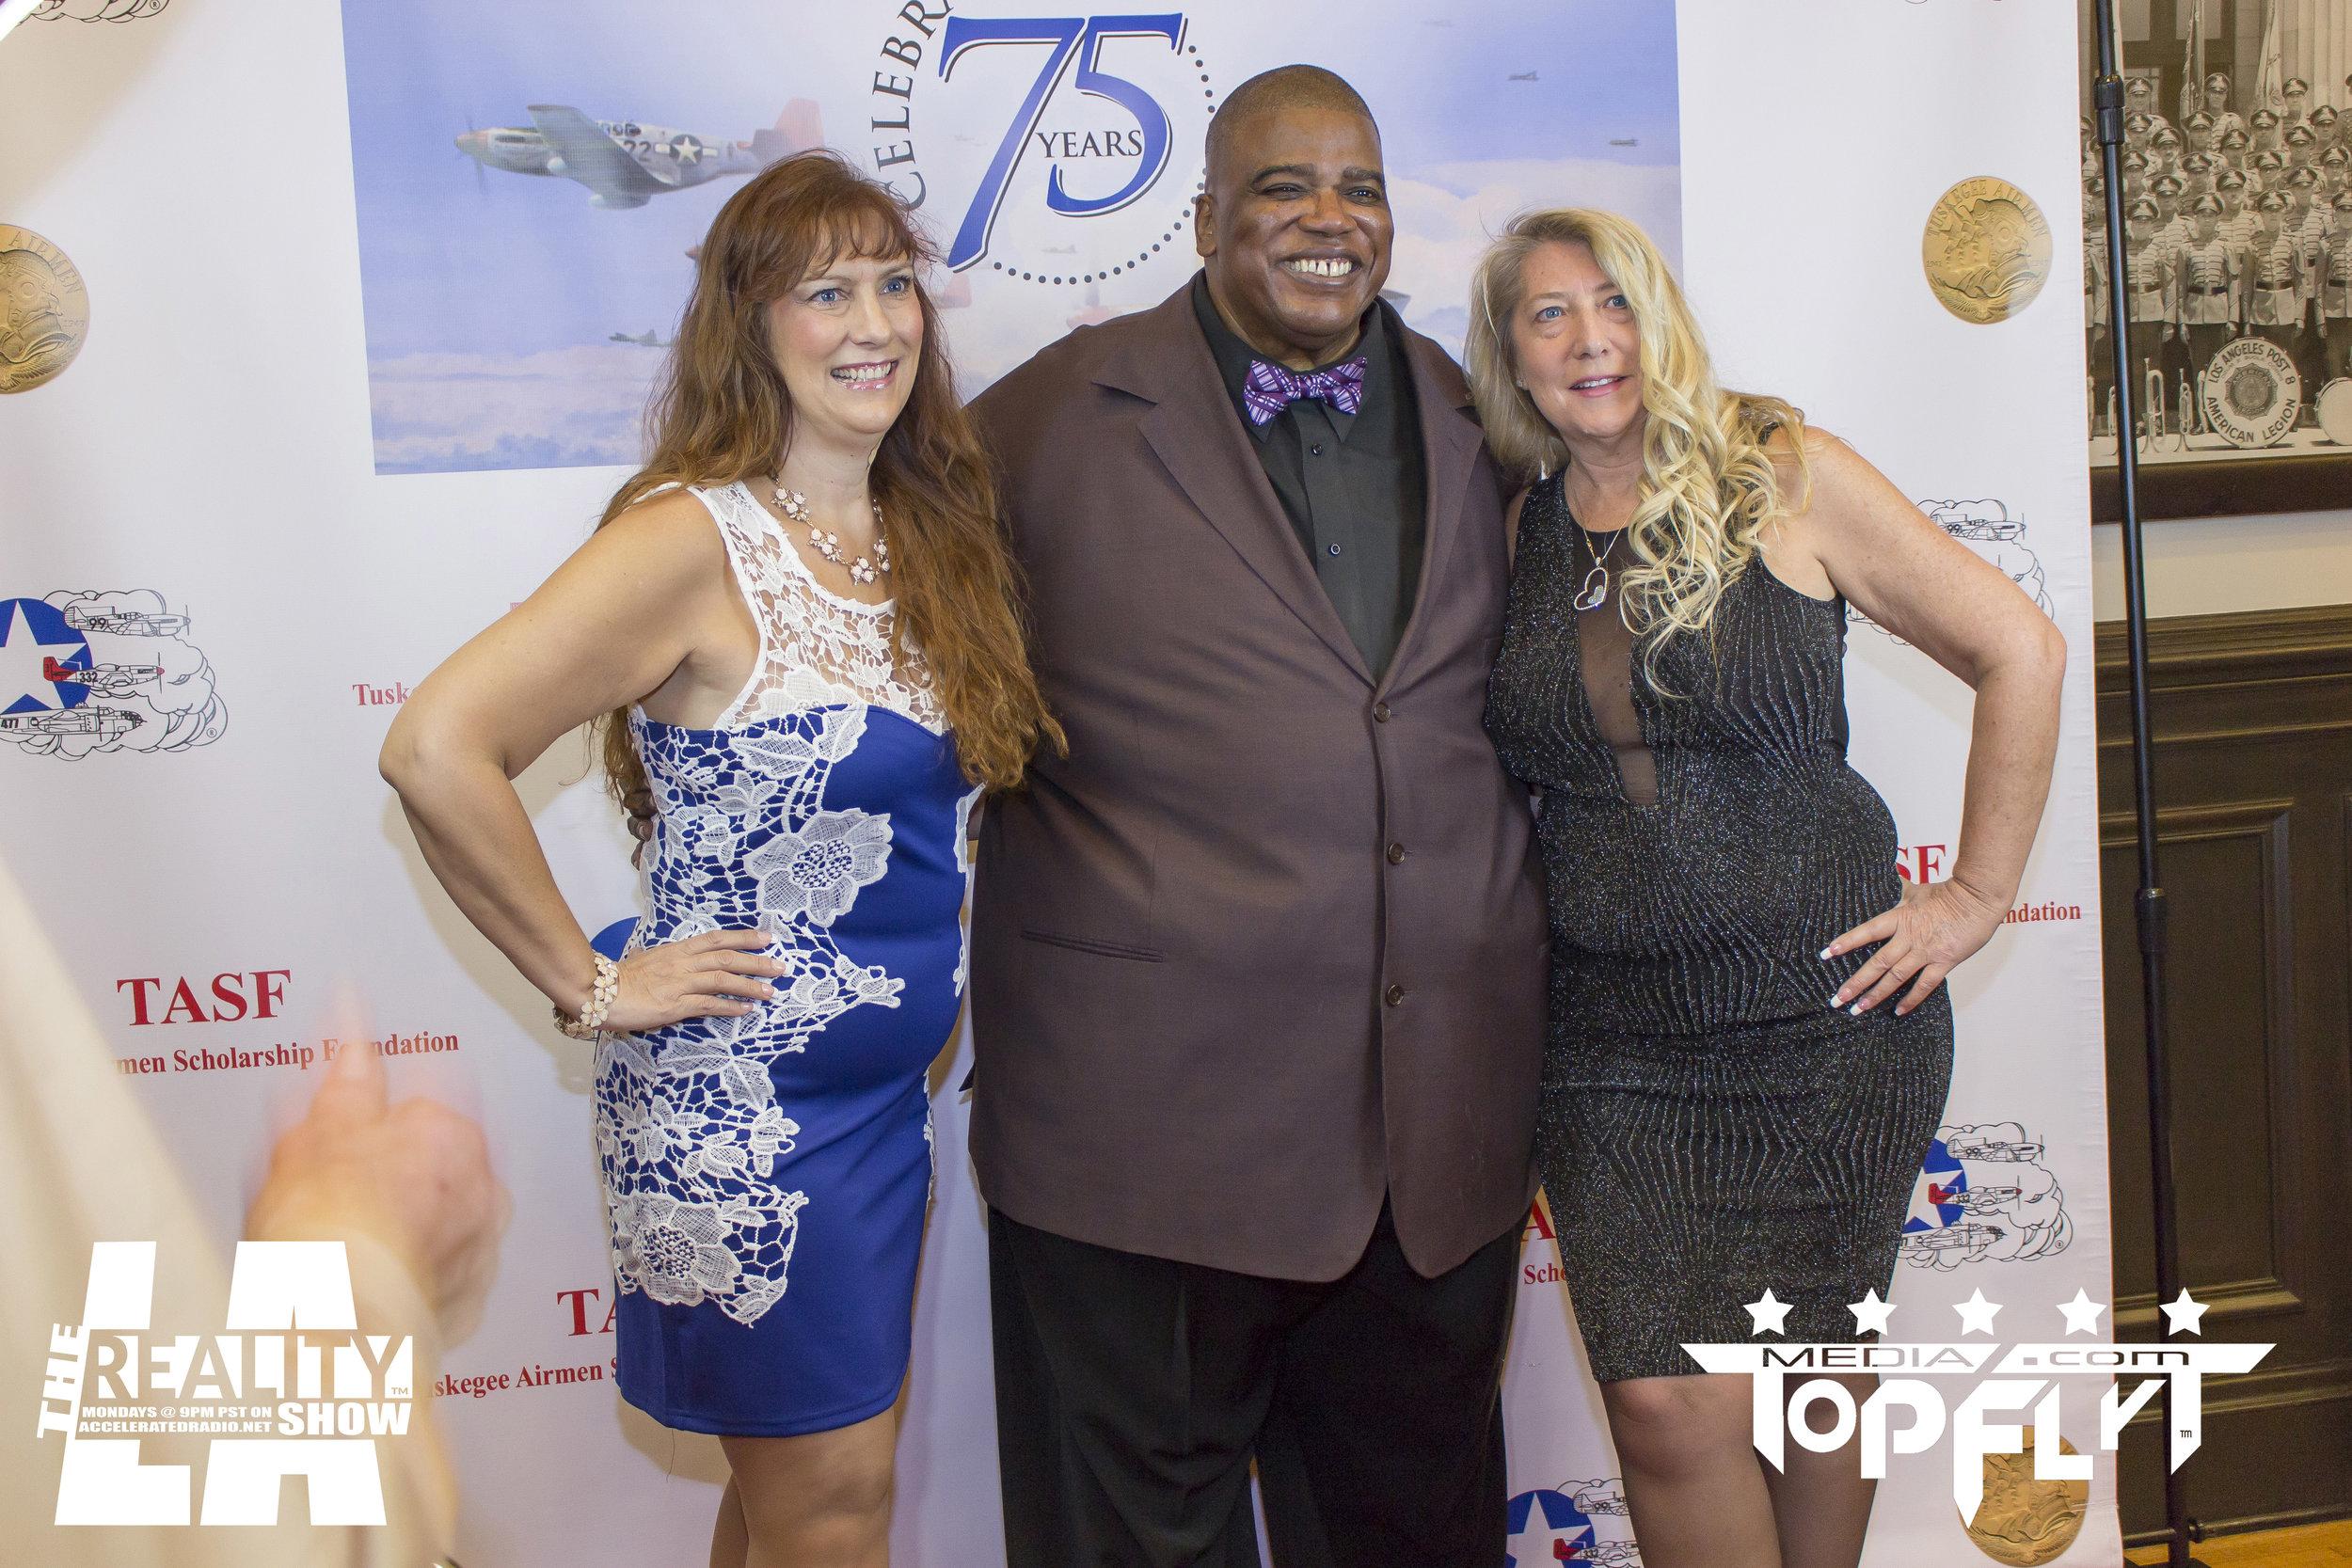 The Reality Show LA - Tuskegee Airmen 75th Anniversary VIP Reception_42.jpg